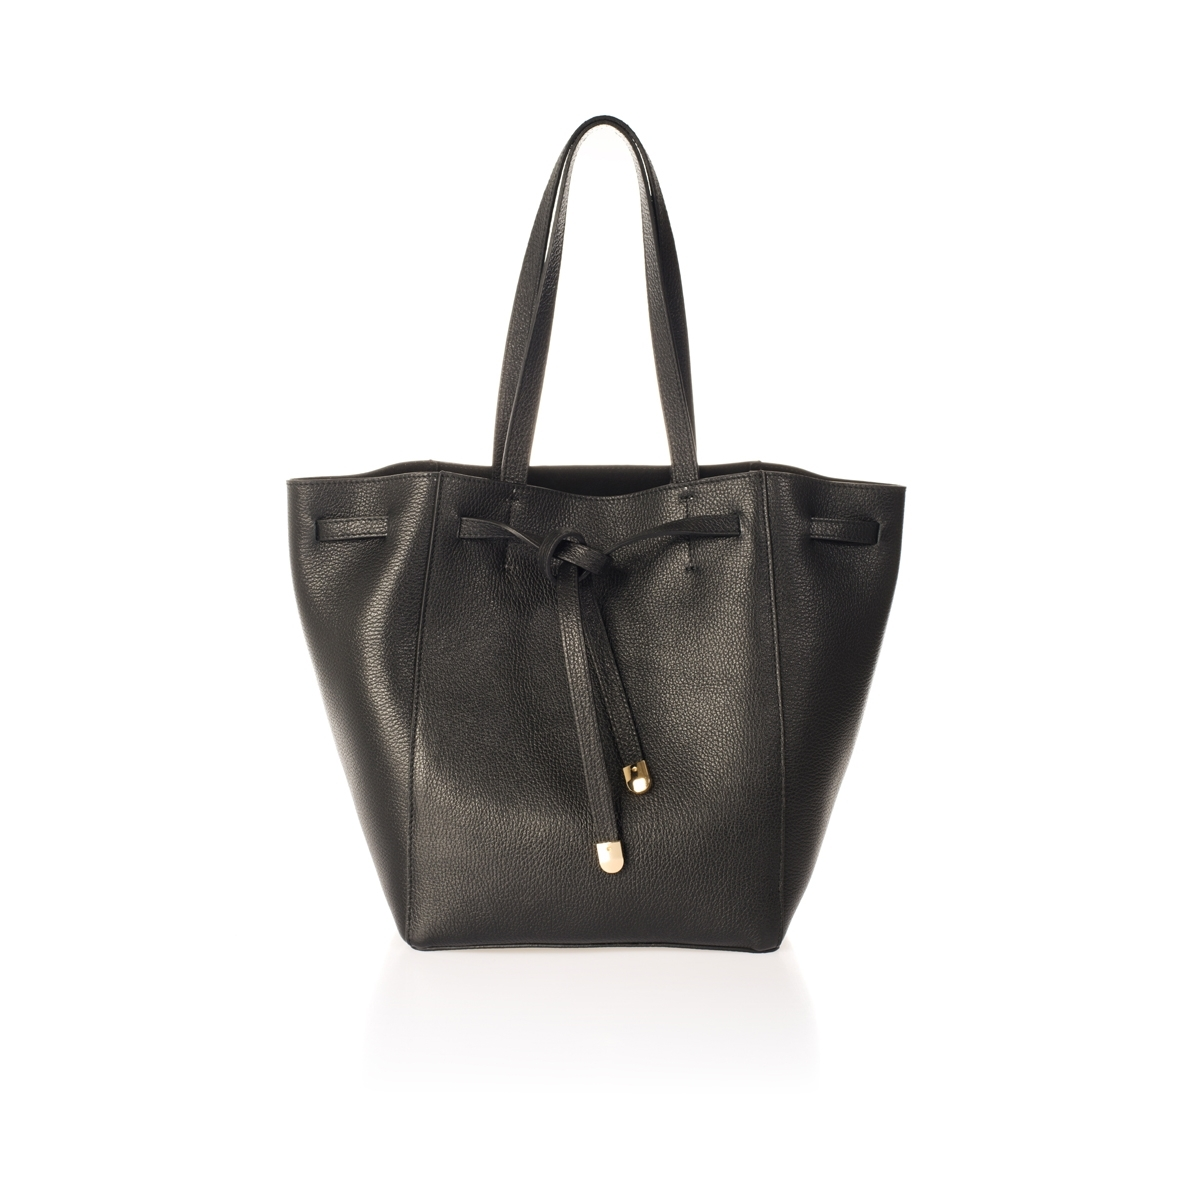 FORTUNA・DOLLARO・BLACK Geanta din piele naturala, neagra, 38/30 dollaro, Magrot 512